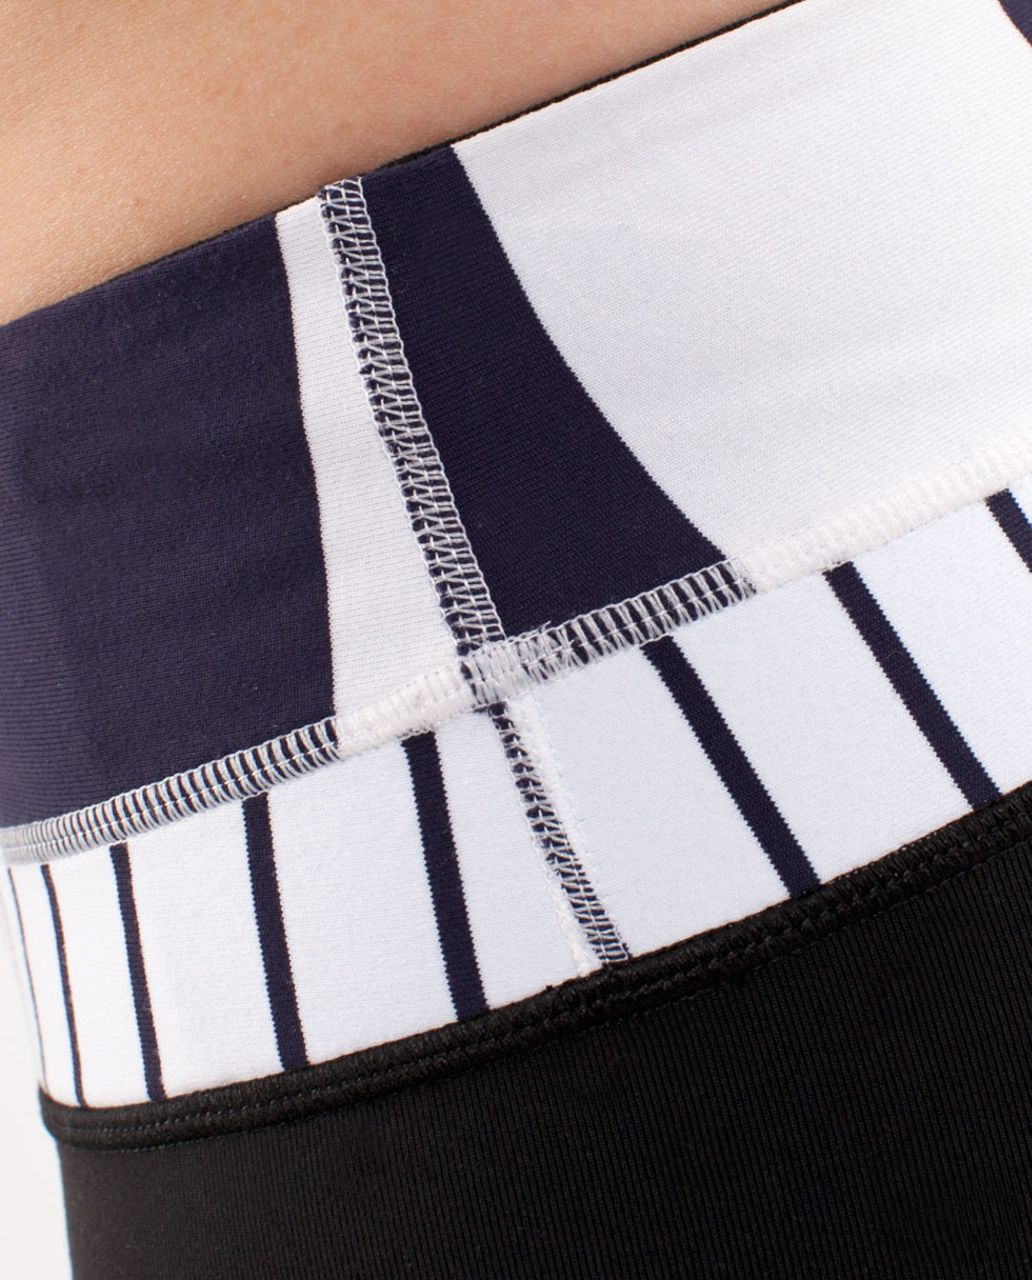 Lululemon Reverse Groove Short *Regular - Black /  Wide Bold Stripe White Deep Indigo /  Quiet Stripe White Deep Indigo